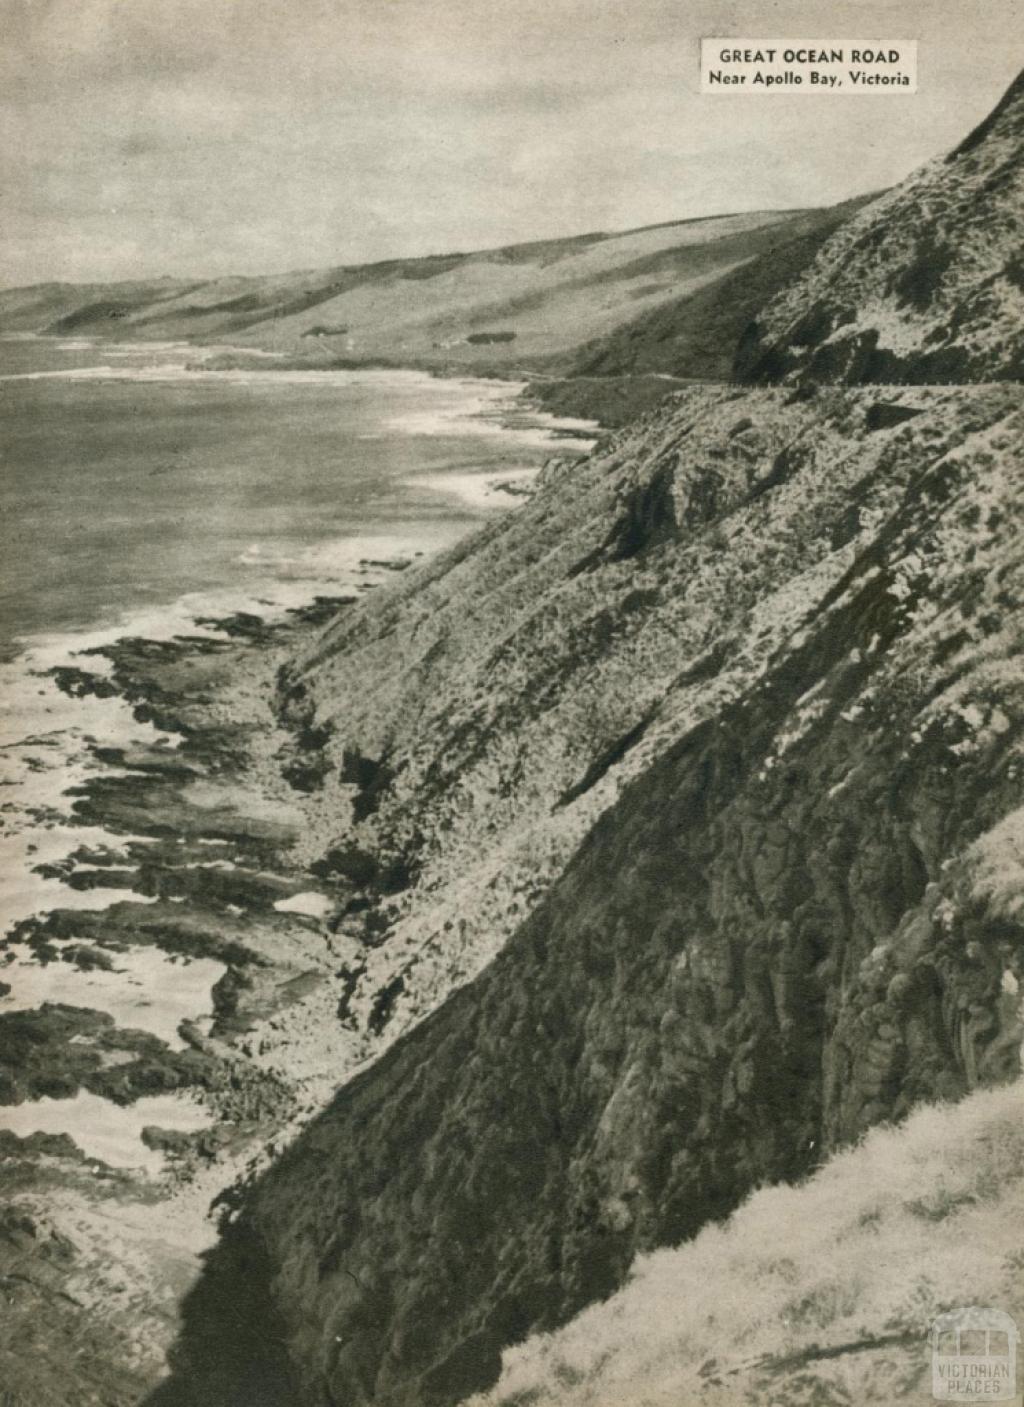 Great Ocean Road, near Apollo Bay, 1954